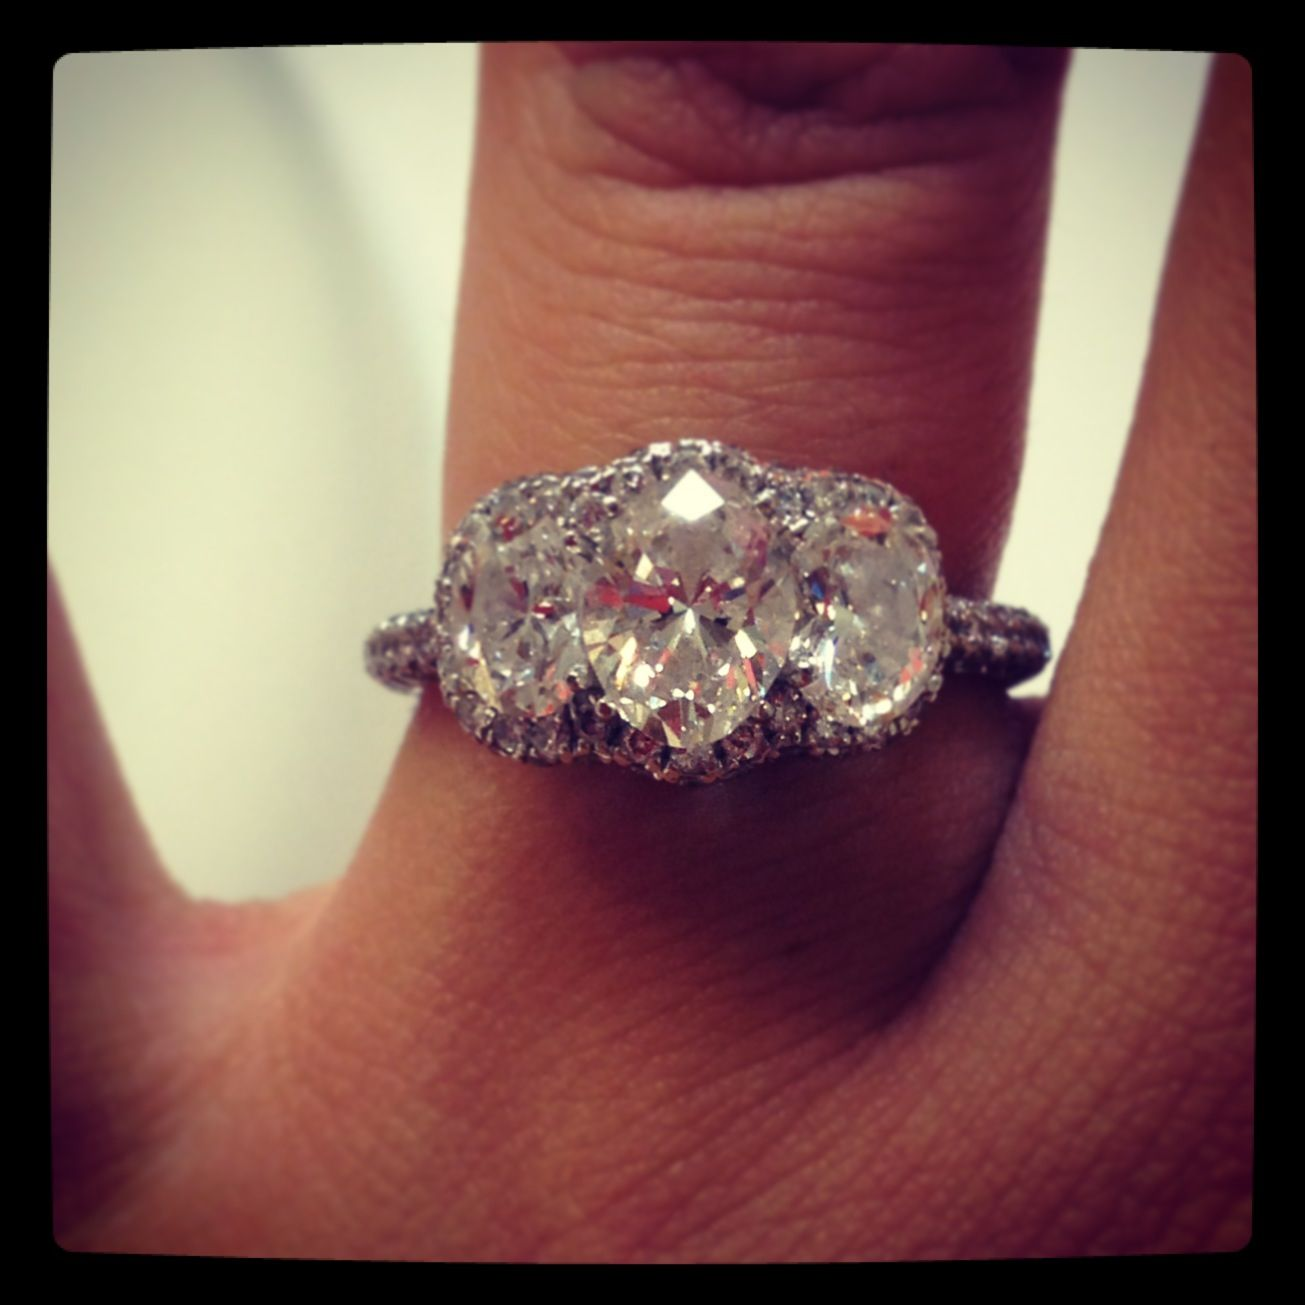 jareds wedding rings Love my engagement ring 2 3 carat Neil lane 3 stone engagement ring from Jared s